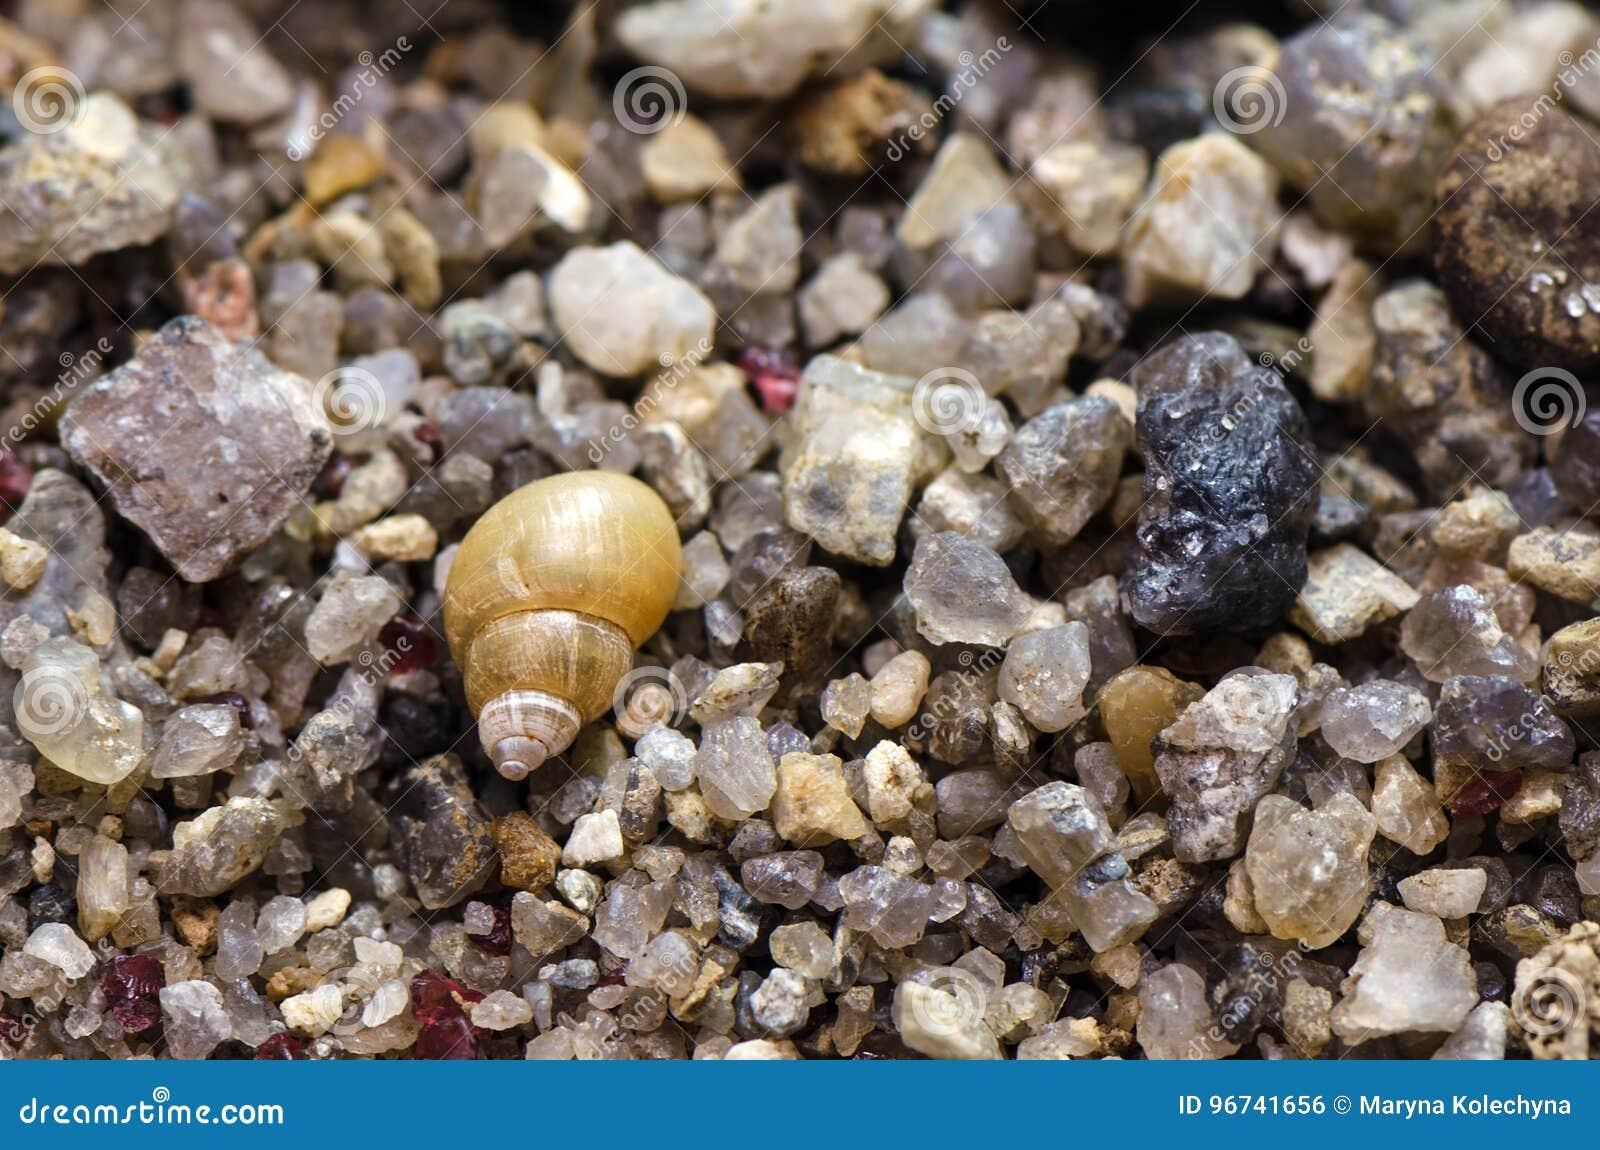 Macro shot of sand at the beach.